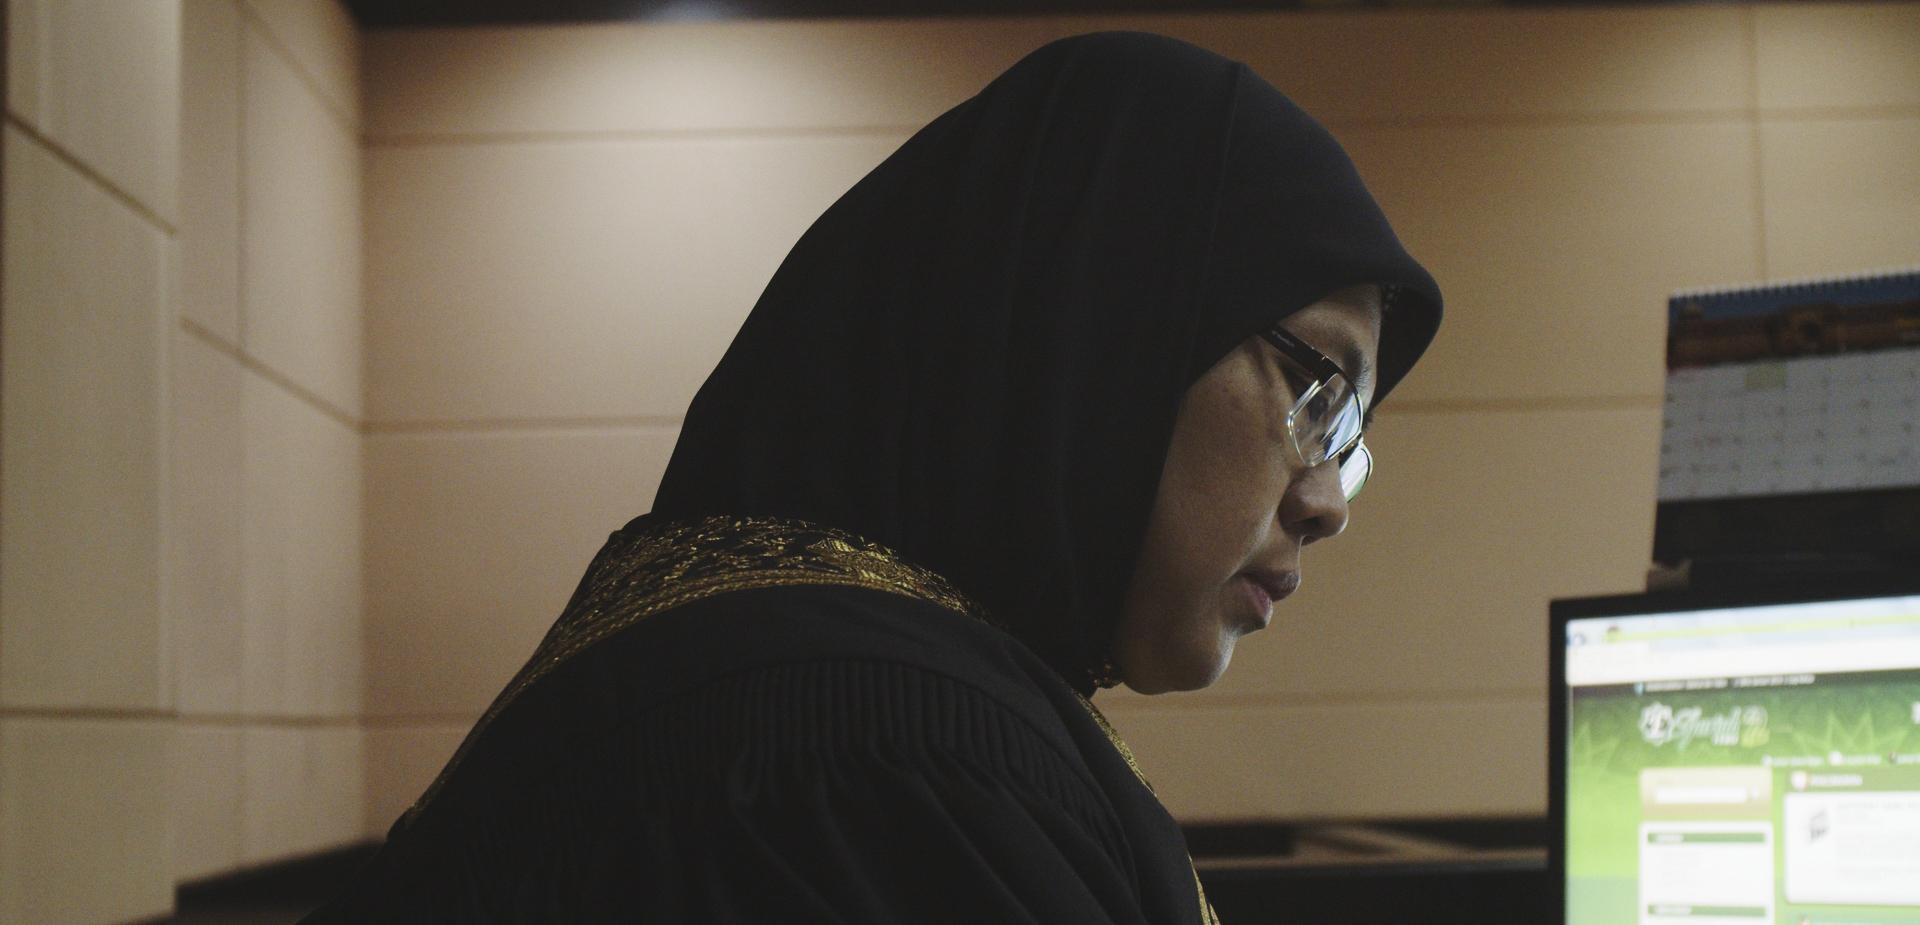 malay judge-9.jpg